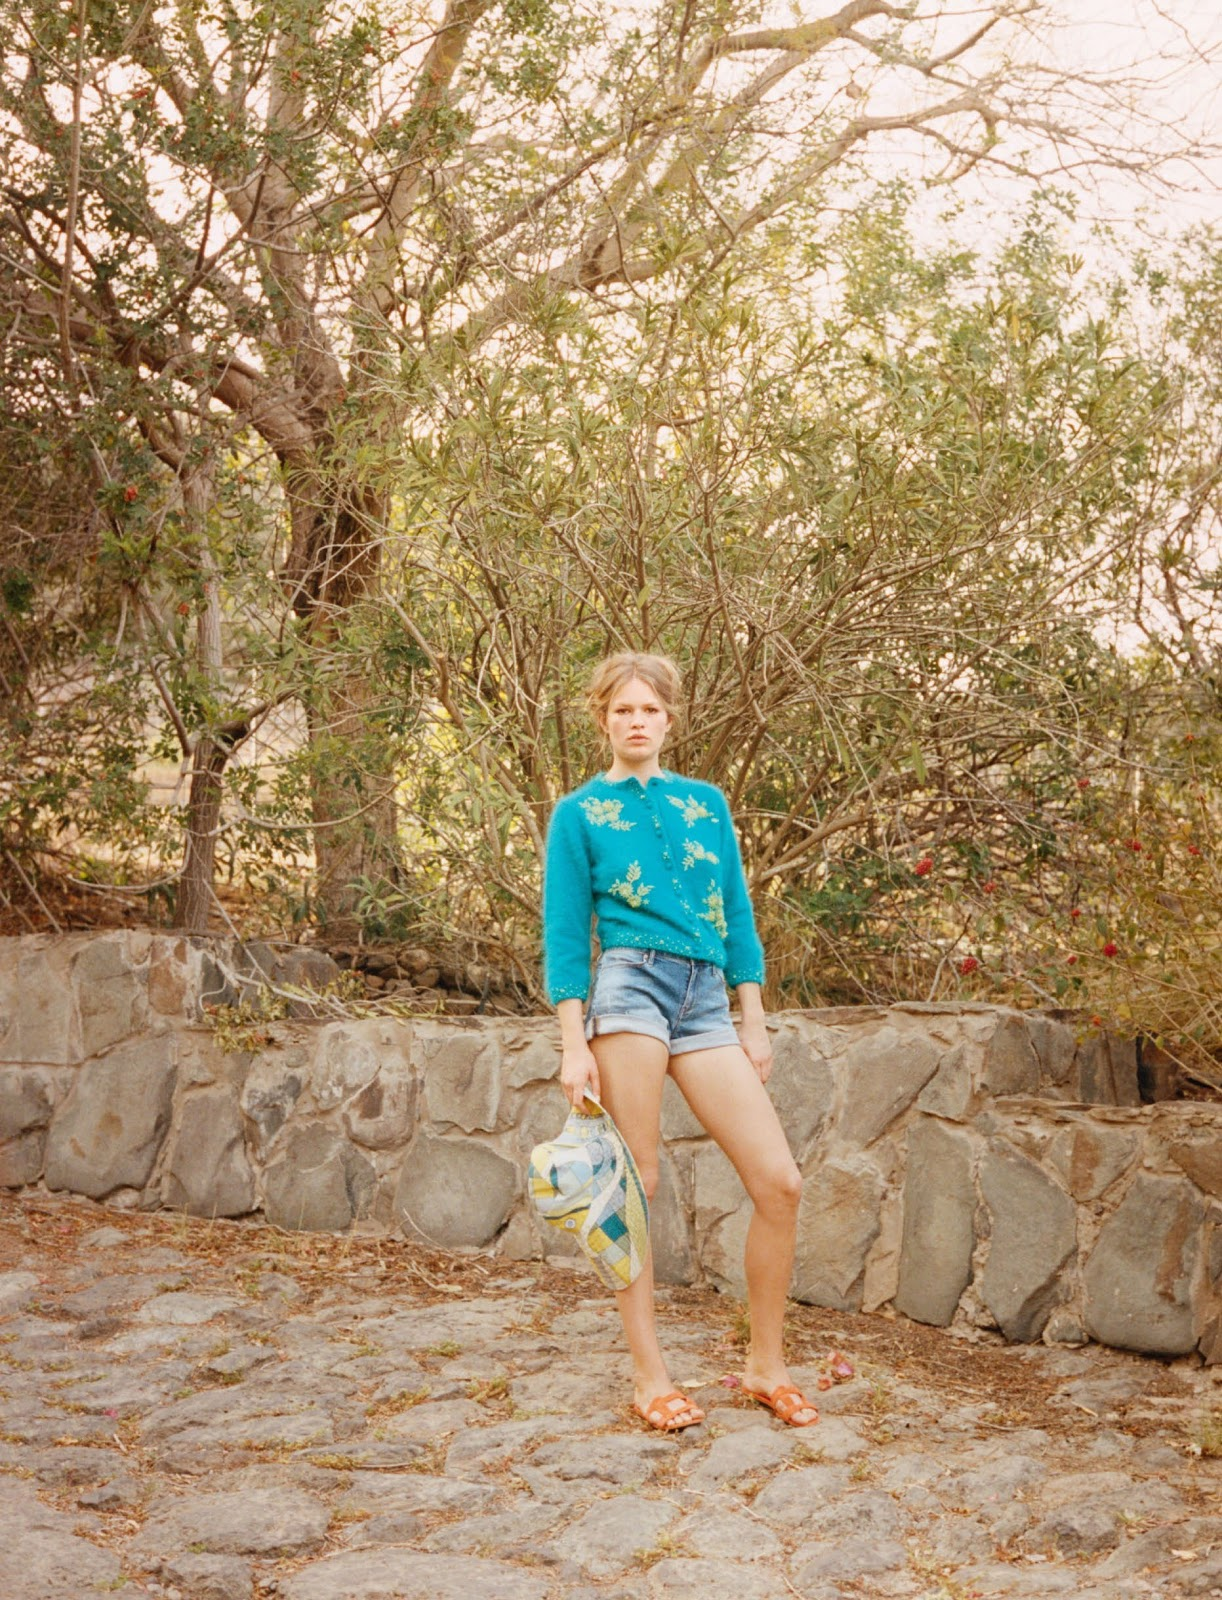 Prada cardigan; Calvin Klein Jeans shorts; Patricia Underwood hat; Manolo Blahnik sandals.